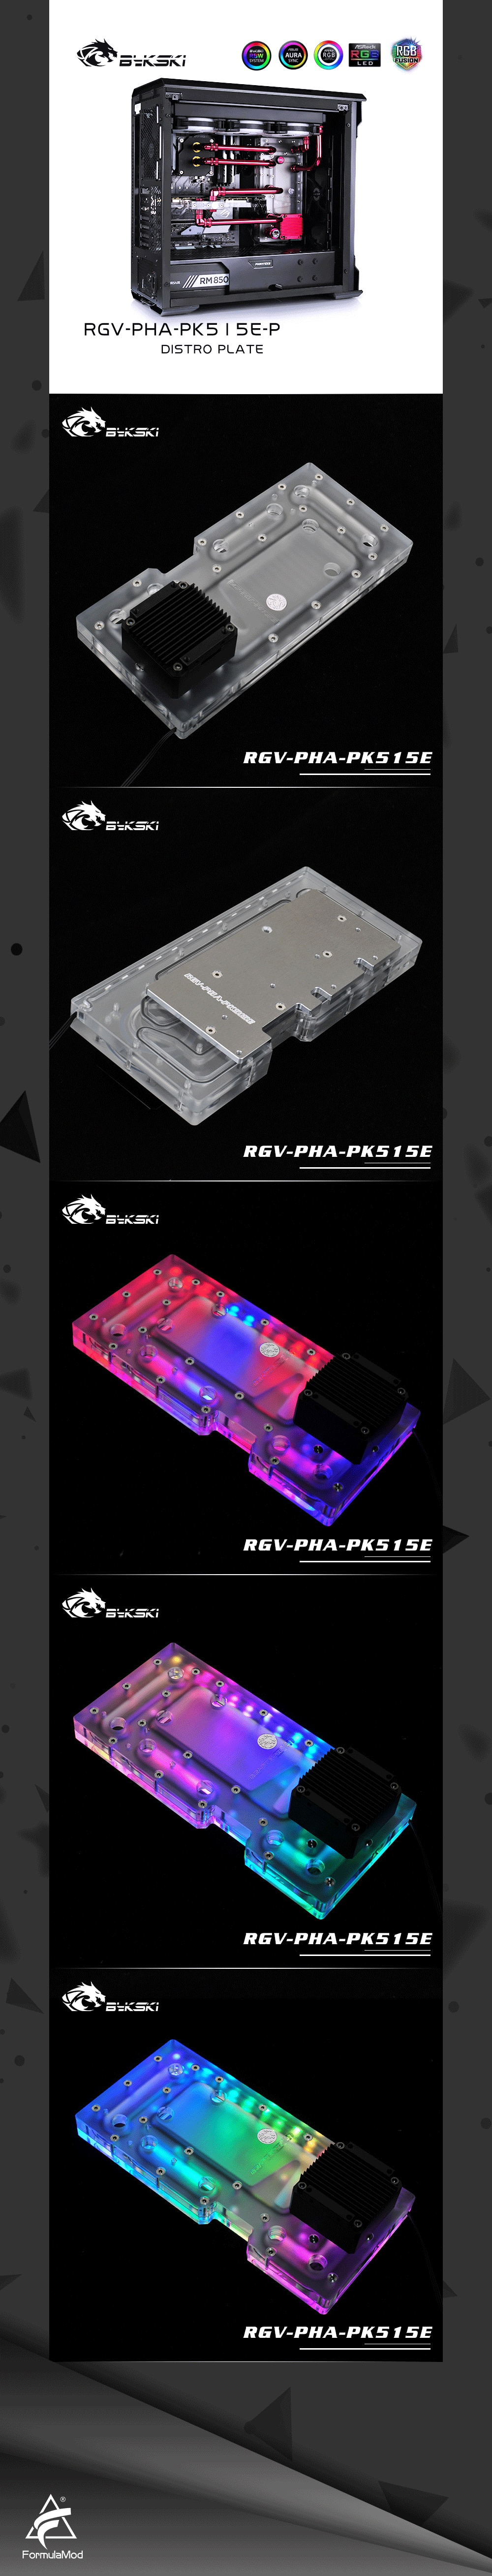 Bykski Waterway Cooling Kit For PHANTEKS PK515E Case, 5V ARGB, For Single GPU Building, RGV-PHA-PK515E-P